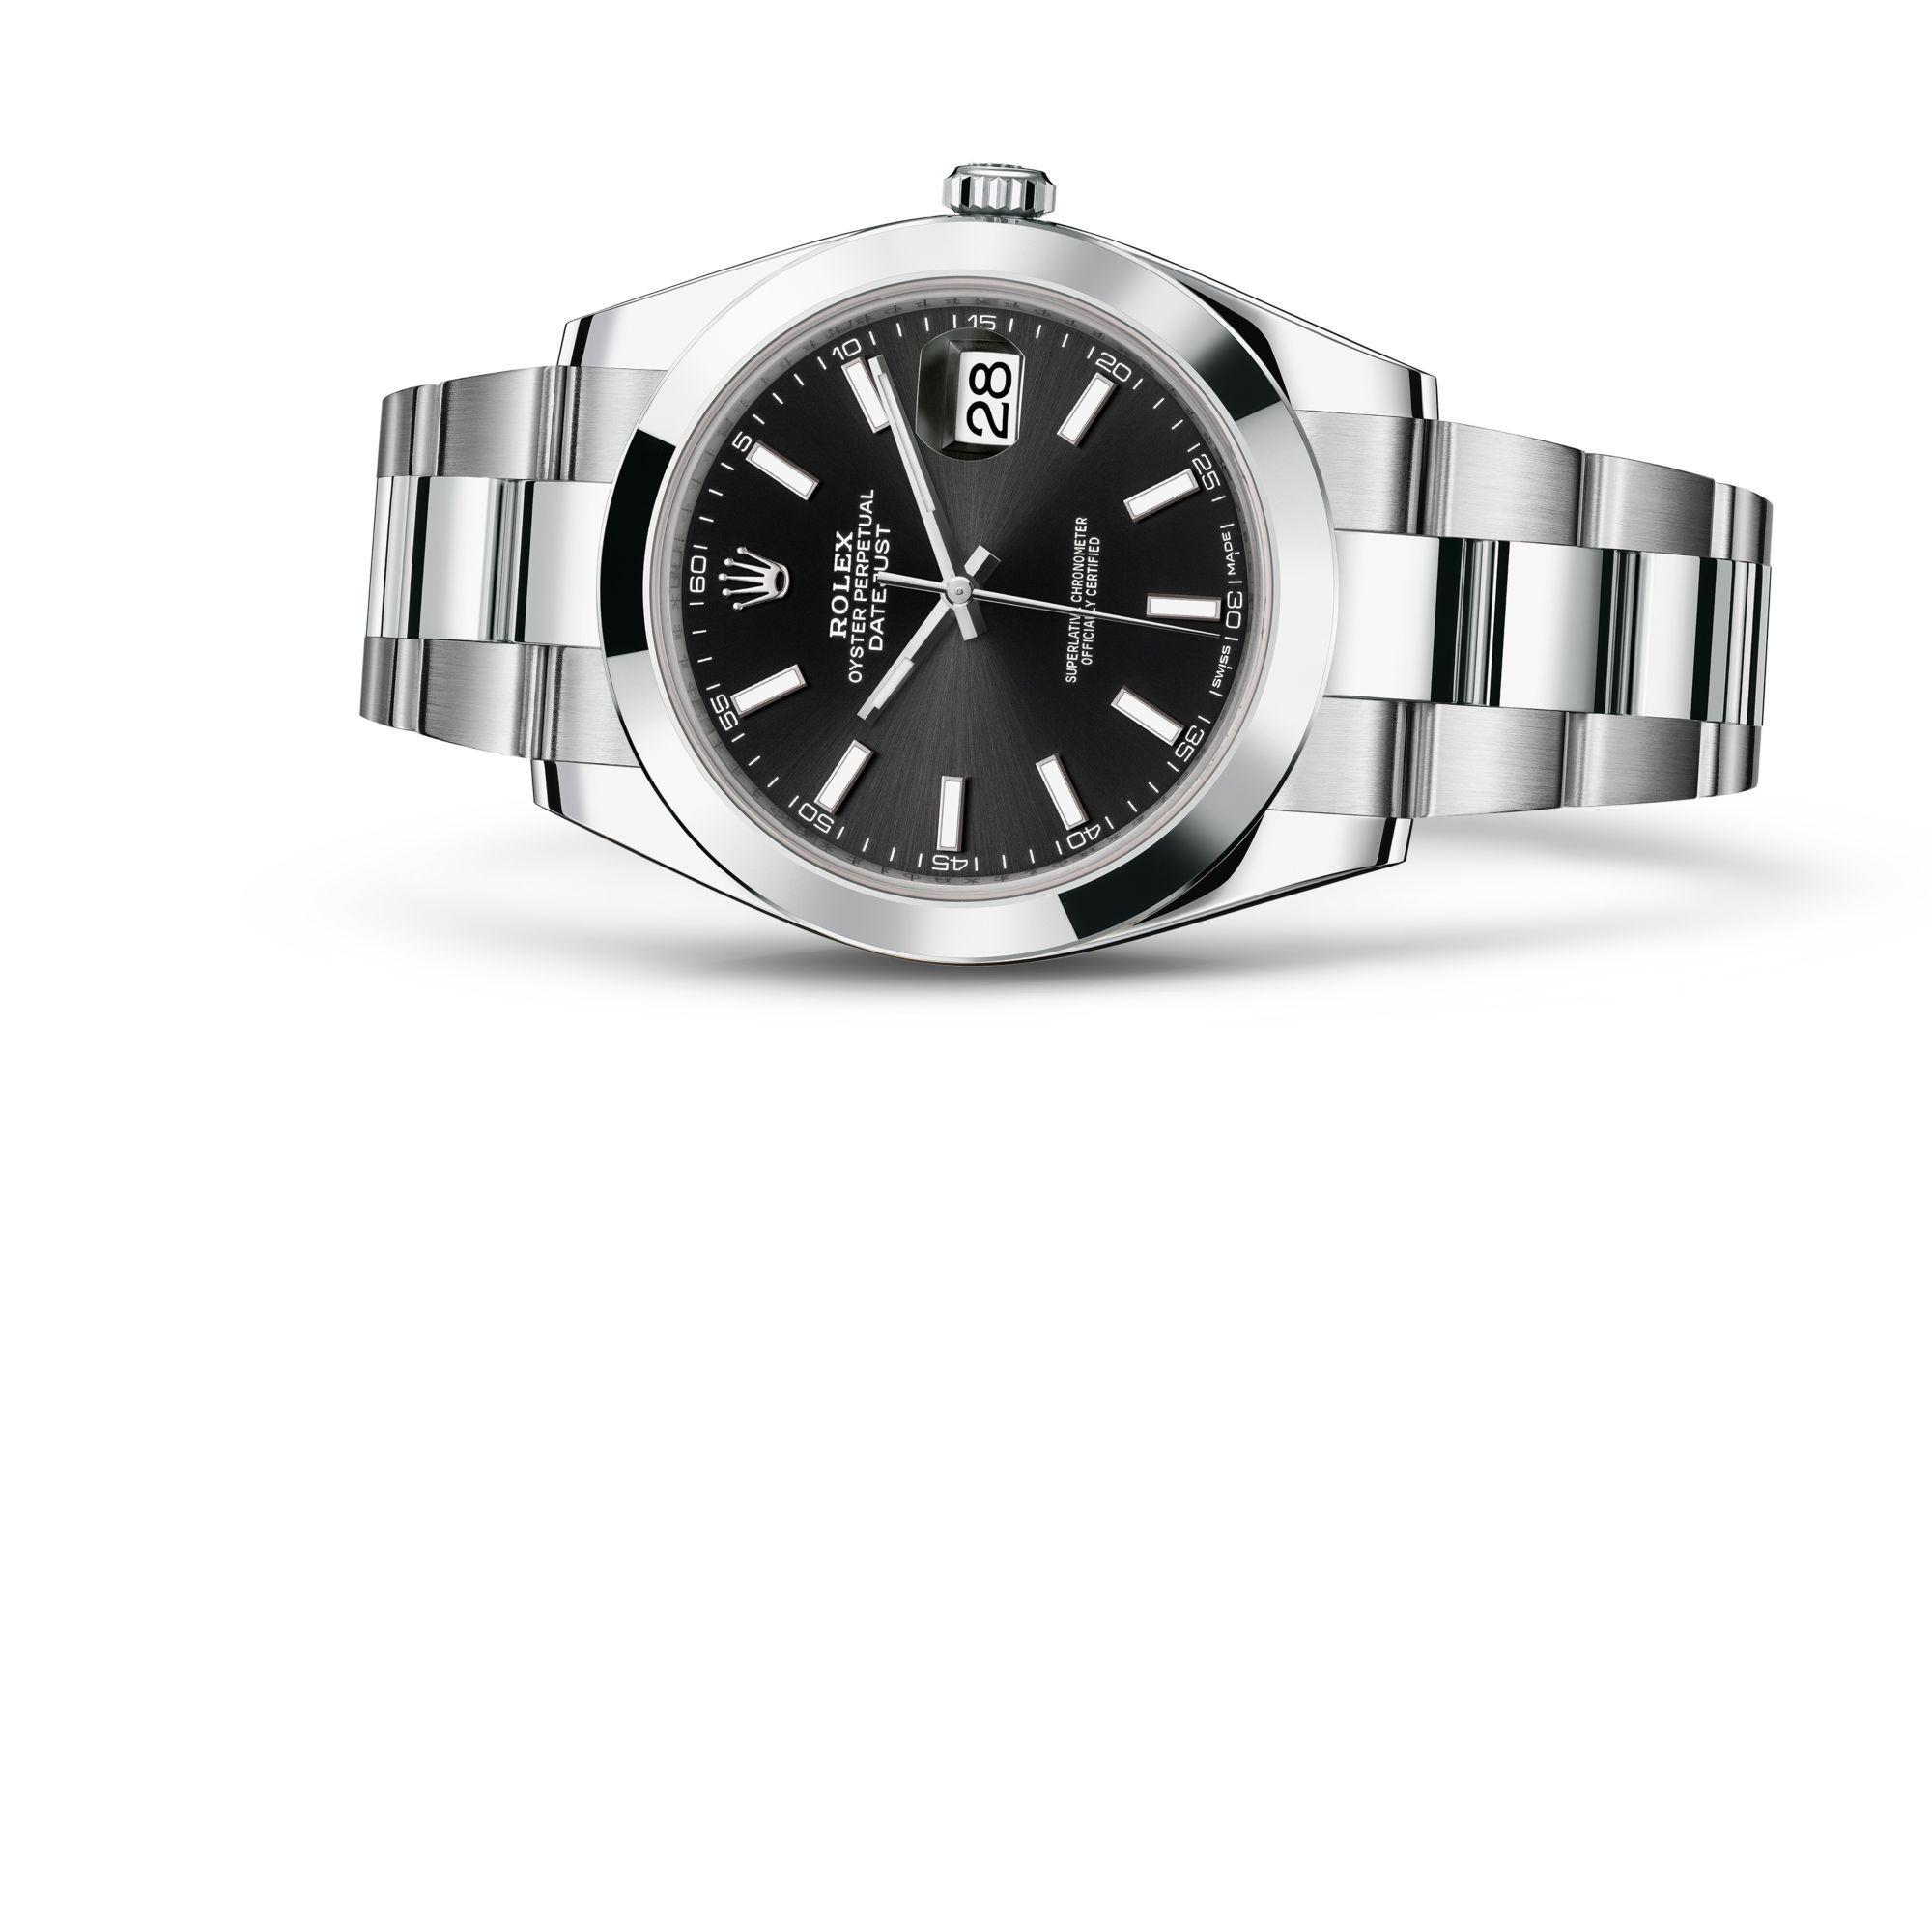 Rolex ديت جست ٤۱ M126300-0011